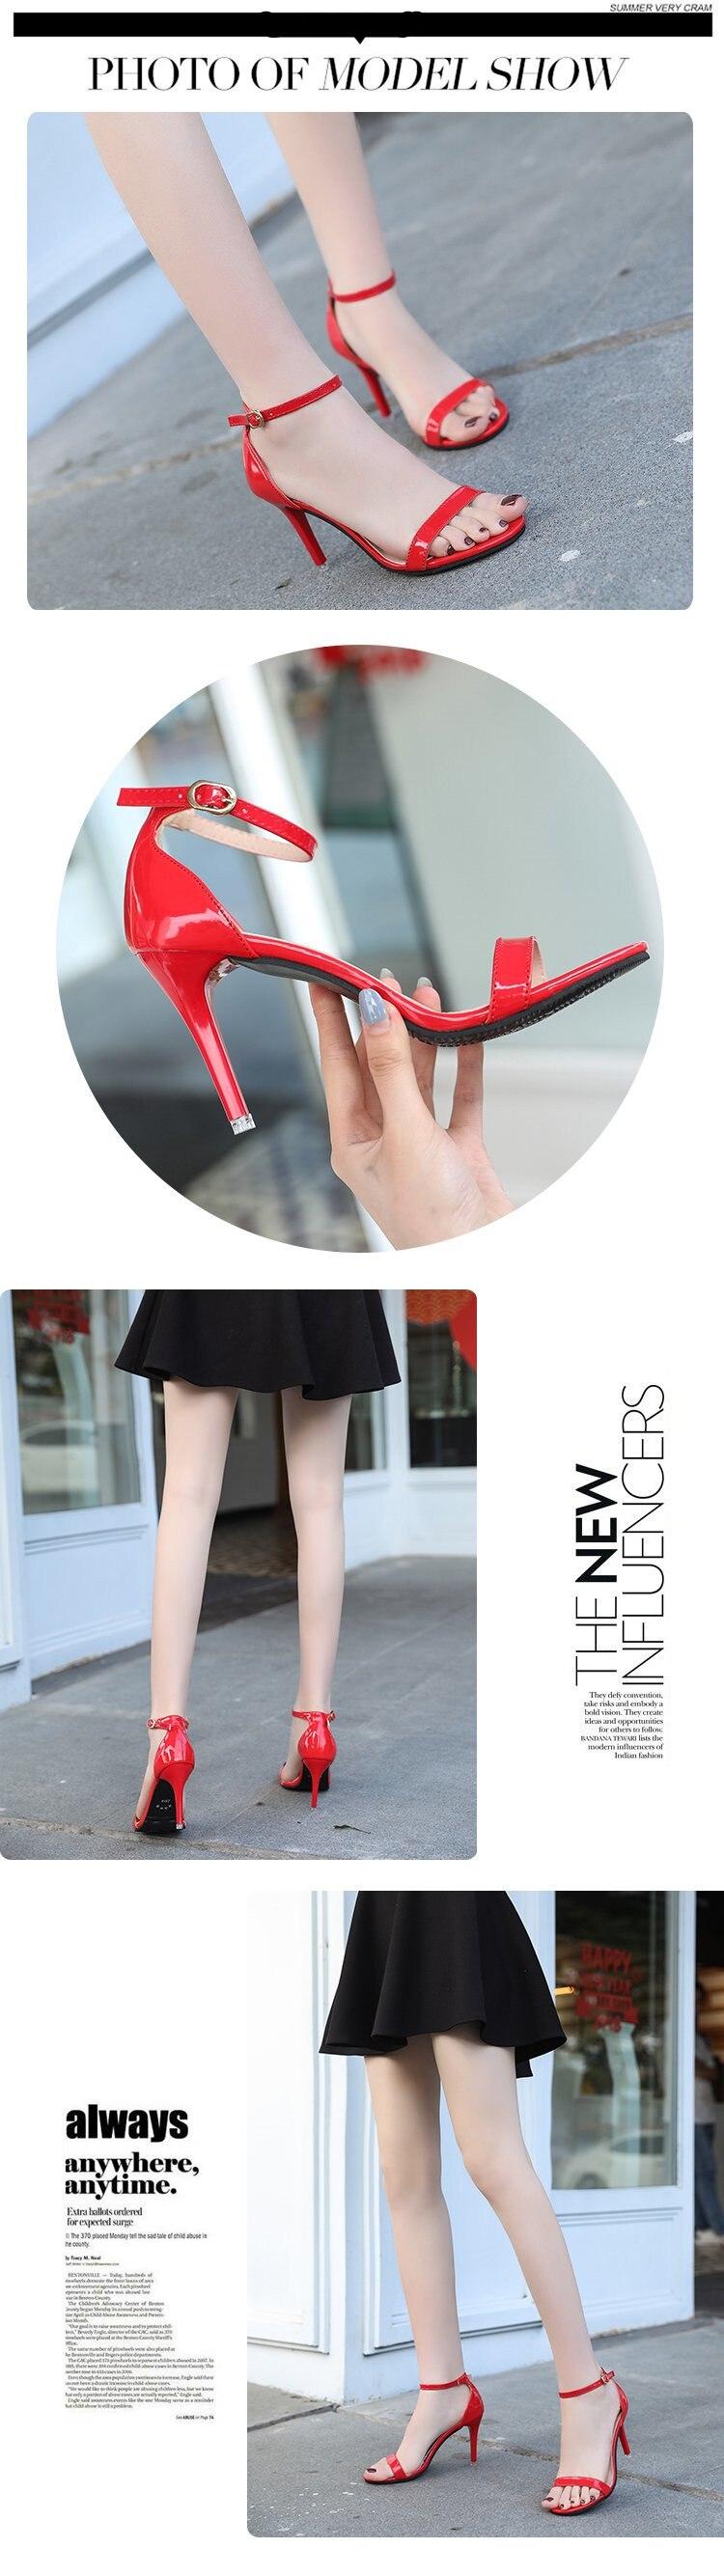 HTB1zYttKPDpK1RjSZFrq6y78VXa9 ORATEE Fashion Ankle Strap Women Casual Sandals Open Toe Summer High Heel Shoes Buckle Ladies Office Work Sandalias Shoes